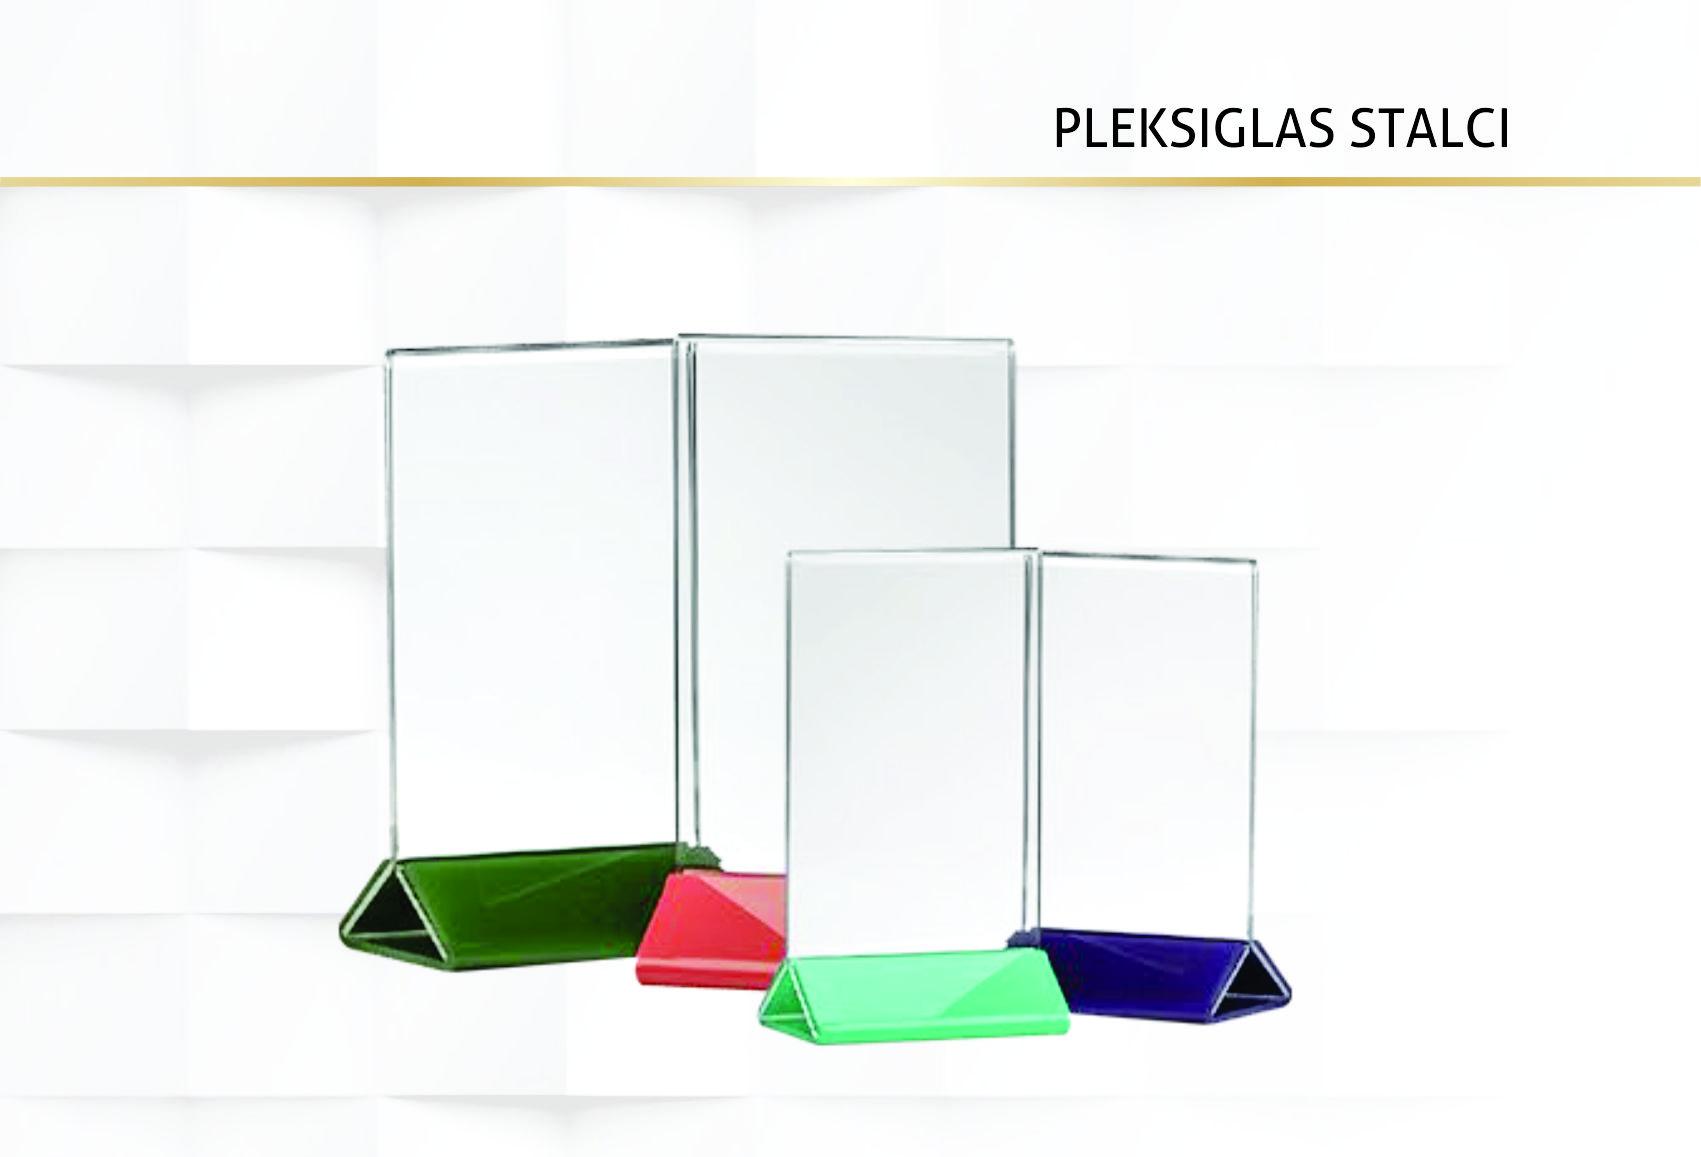 Pleksiglas stalci